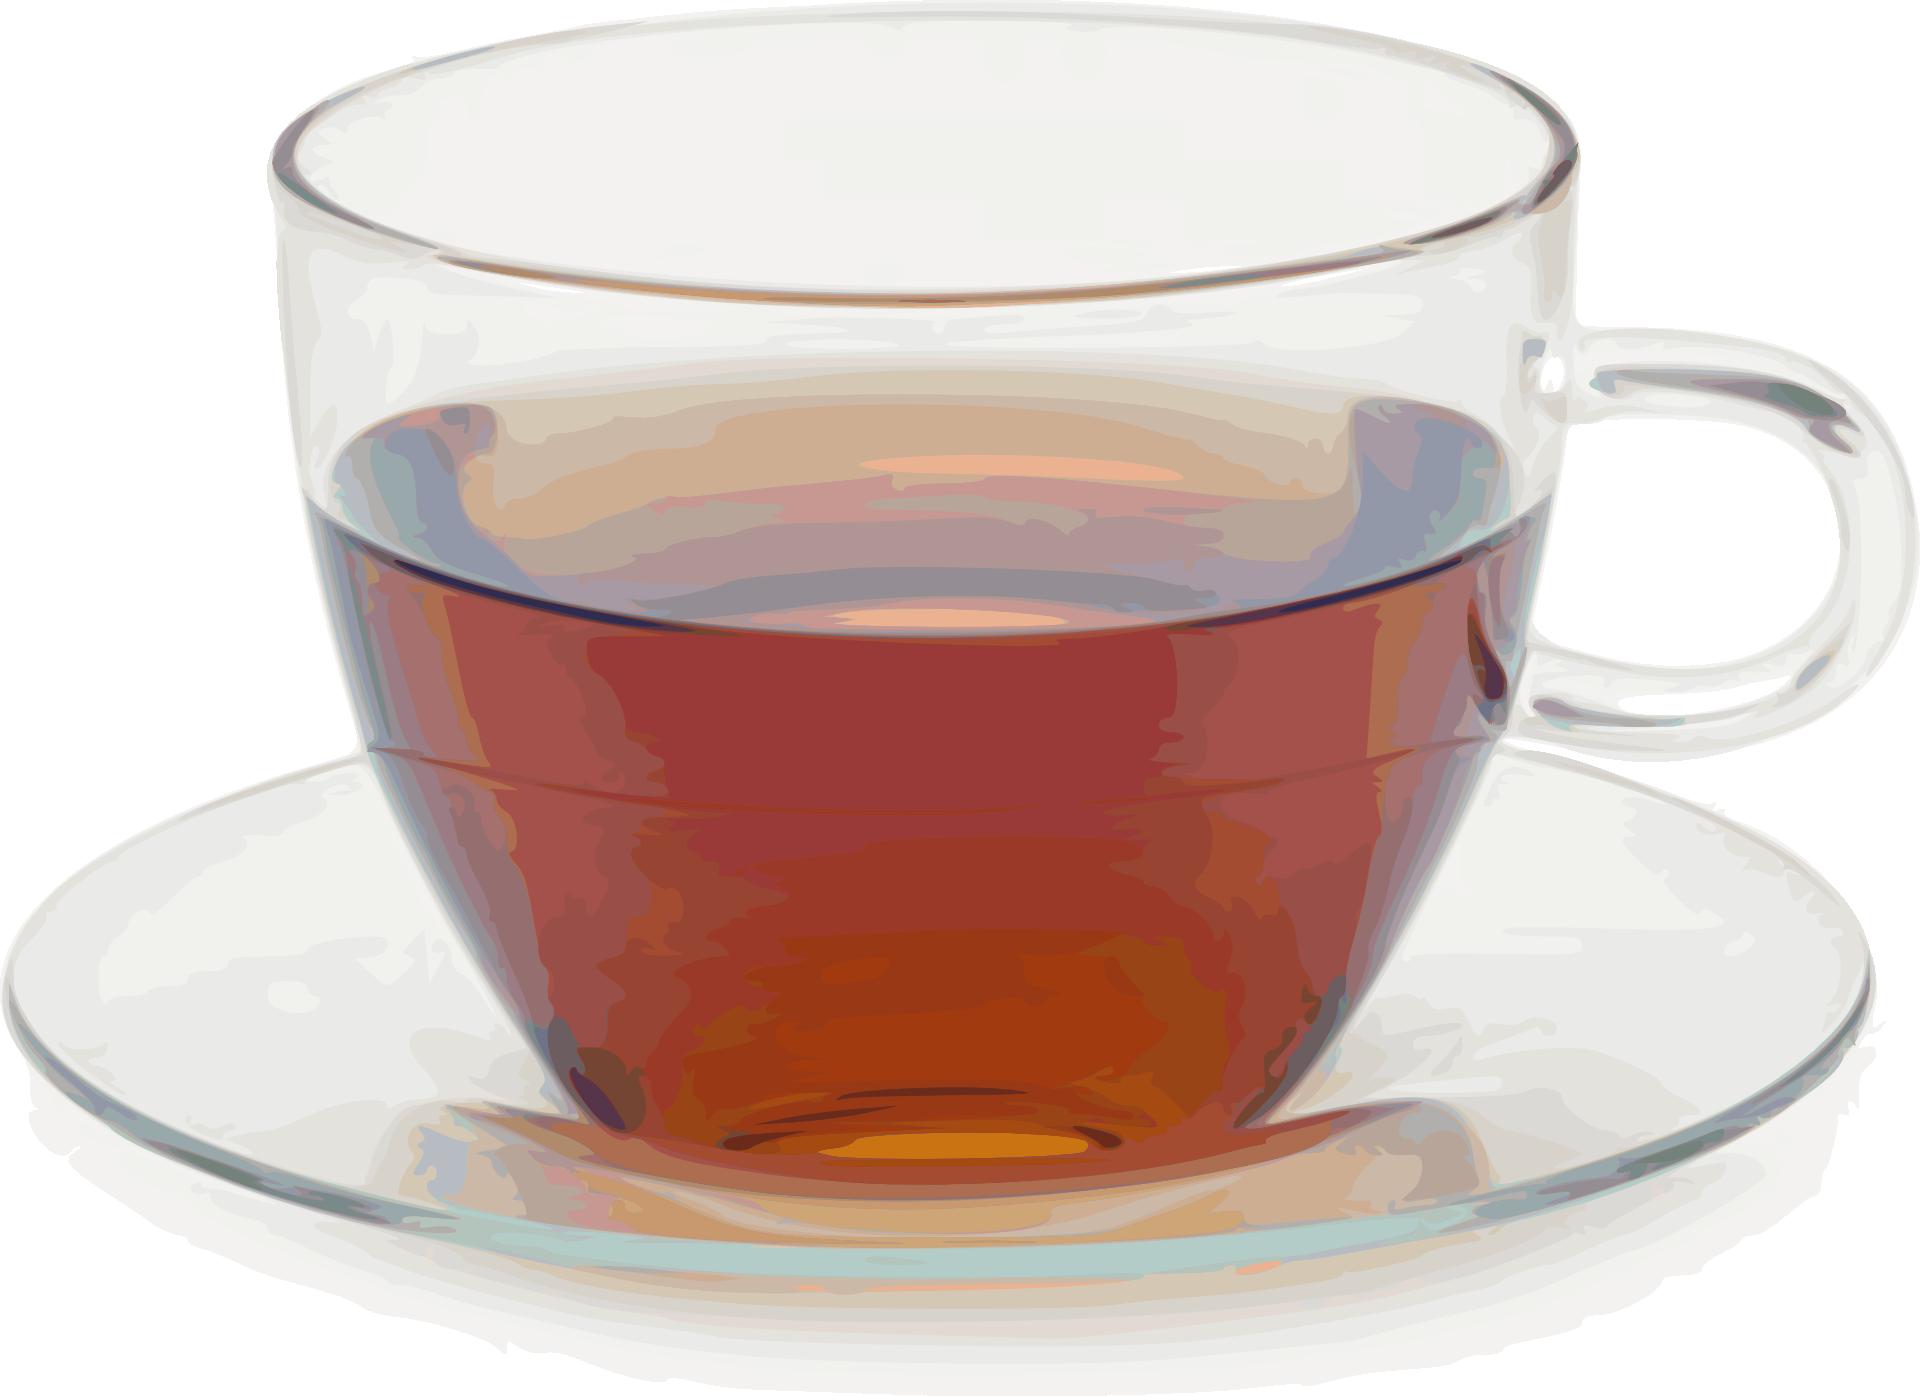 Tea Cup No Background